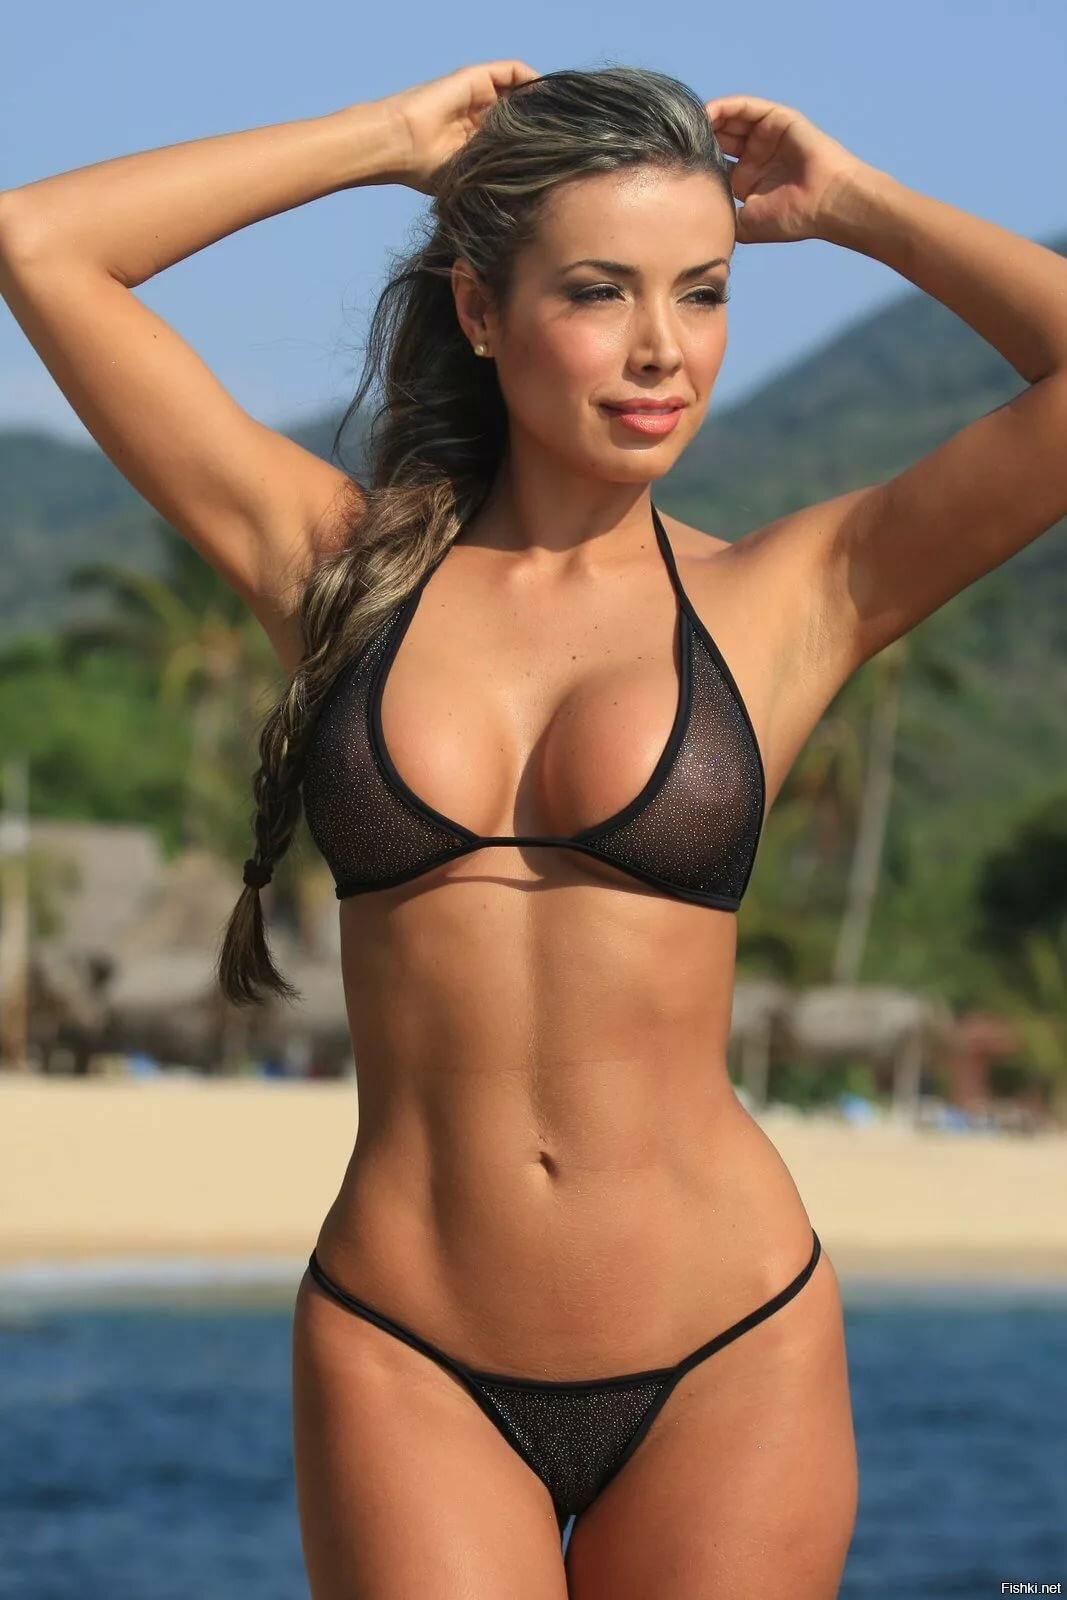 bikini-see-through-jennifer-esposito-sex-video